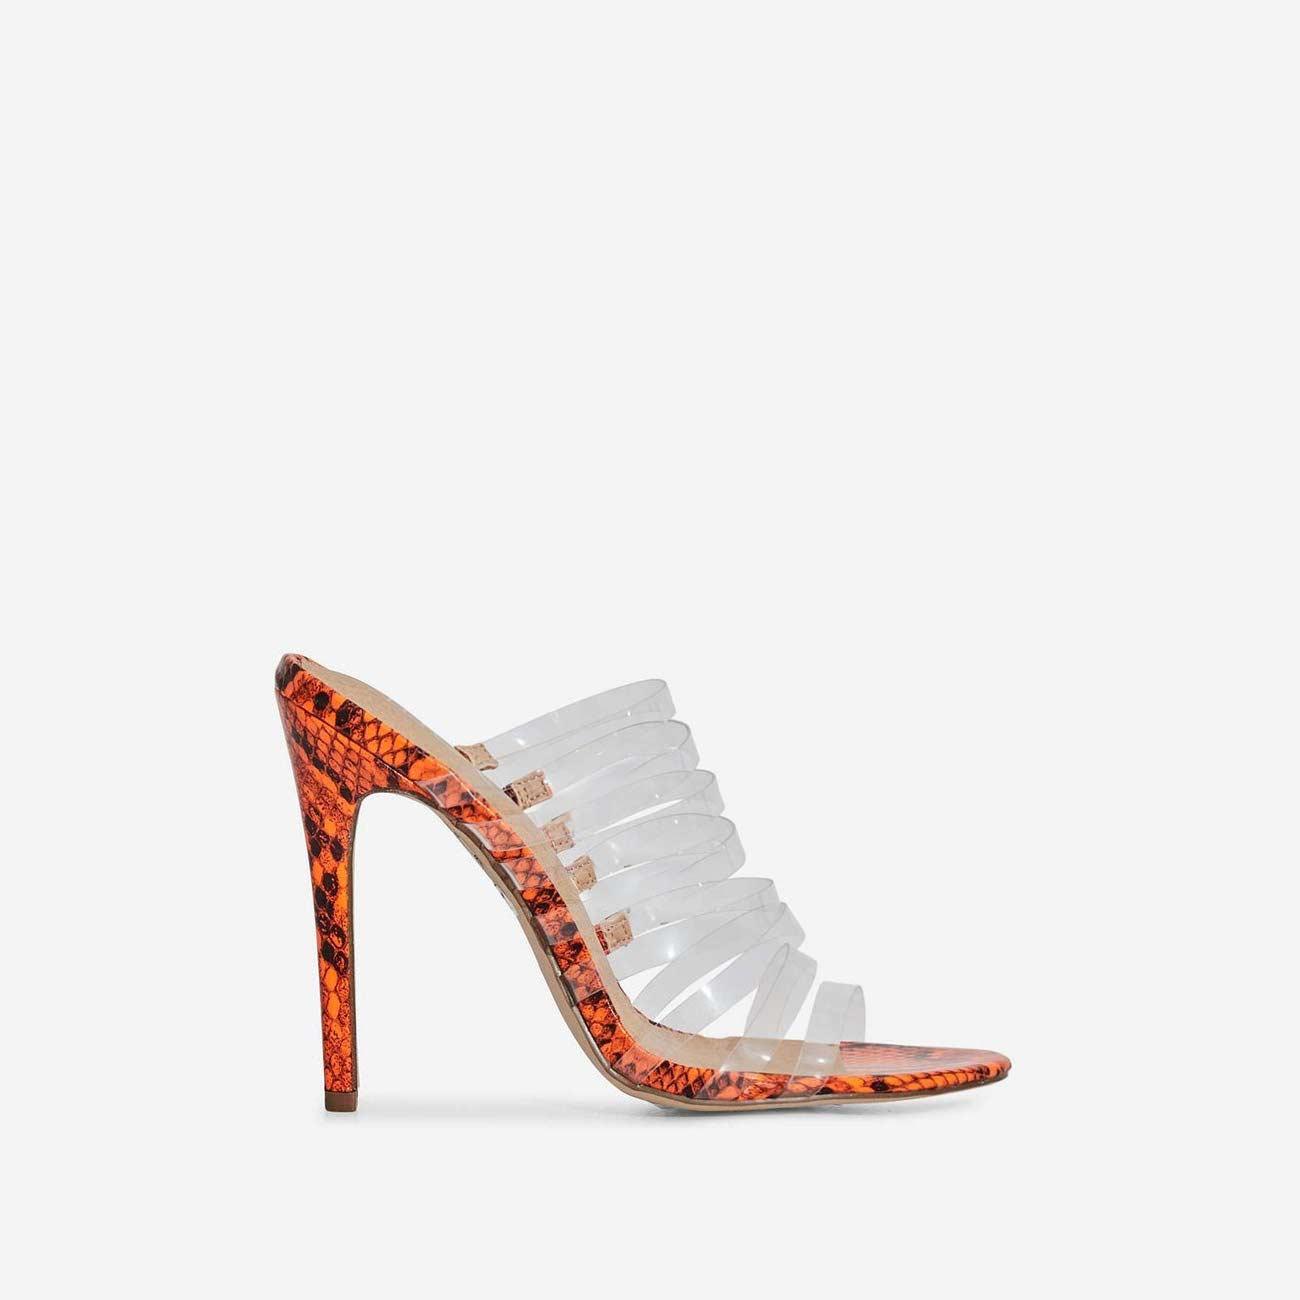 Abby Multi Strap Perspex Heel Mule In Neon Orange Snake Print Faux Leather